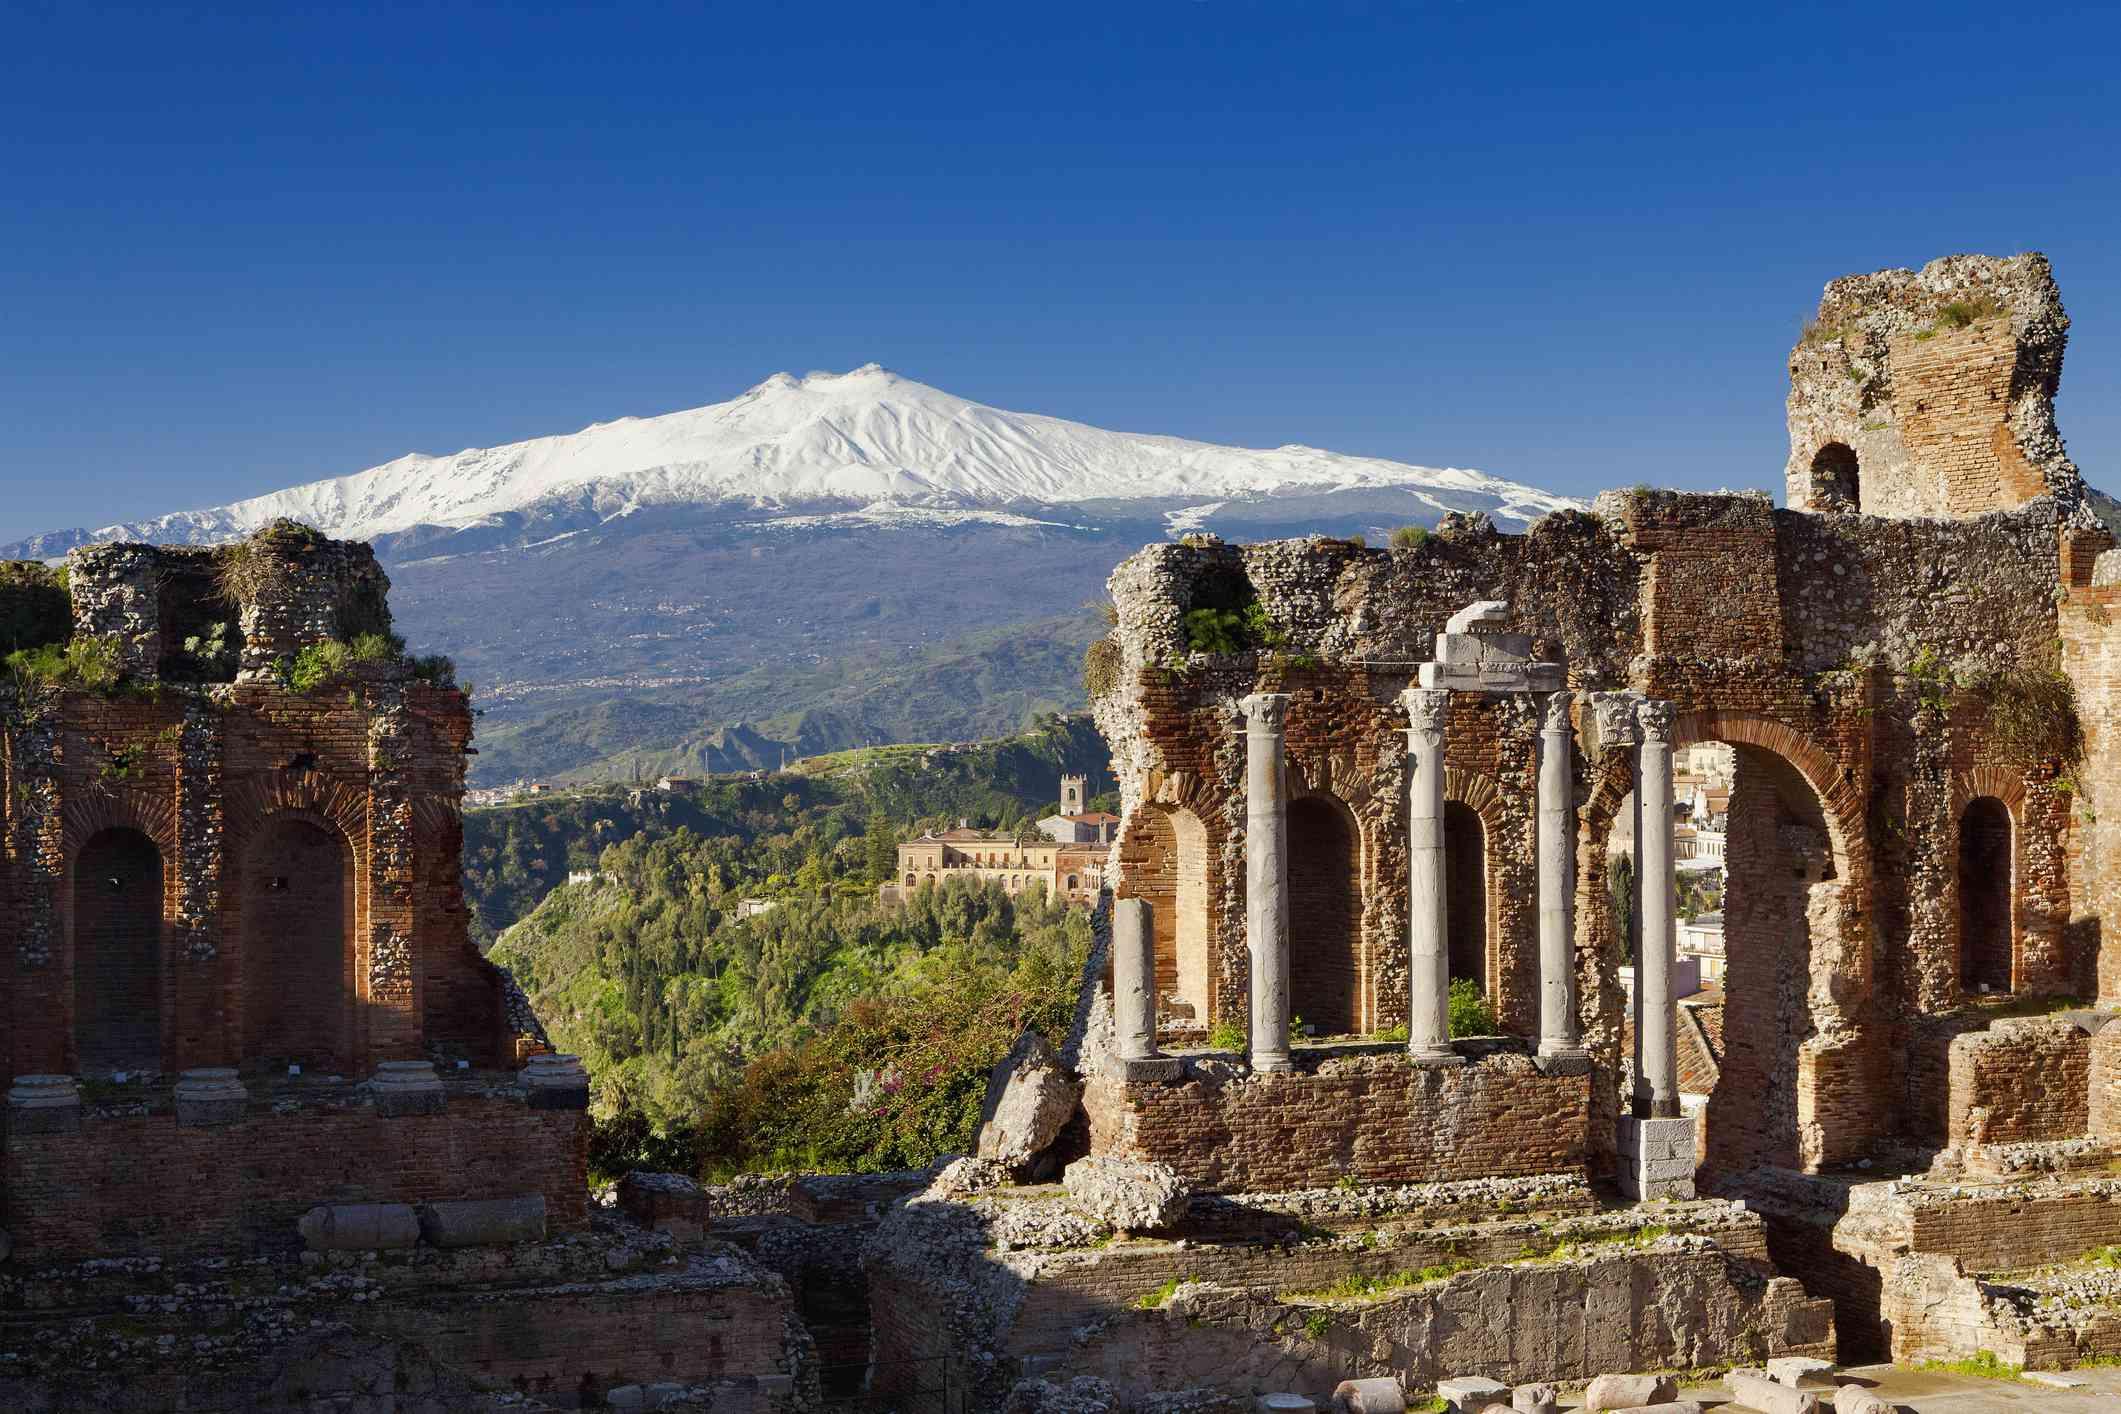 Taormina, Sicily with Mt. Etna